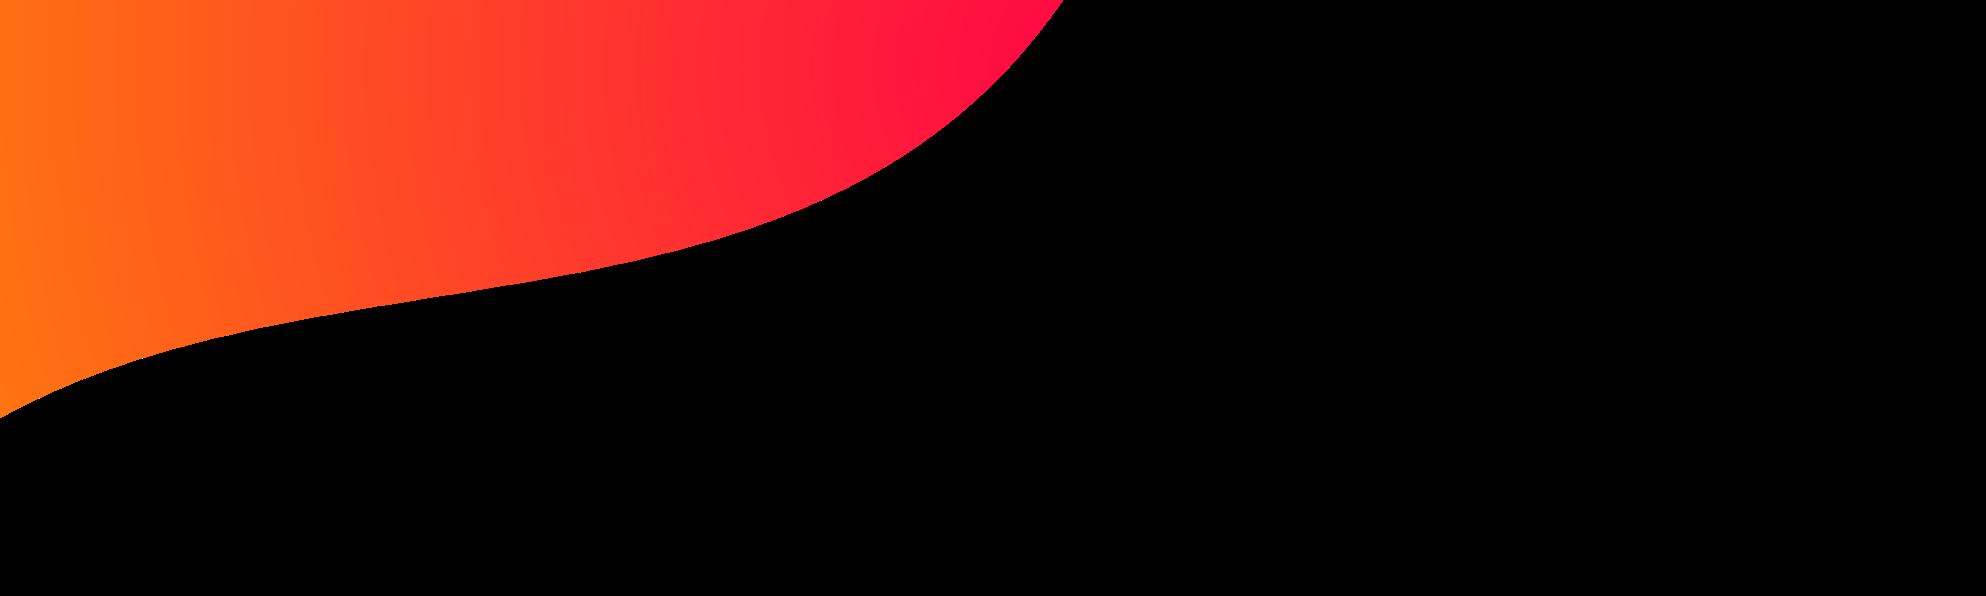 farbverlauf-happy-webinar-links-1